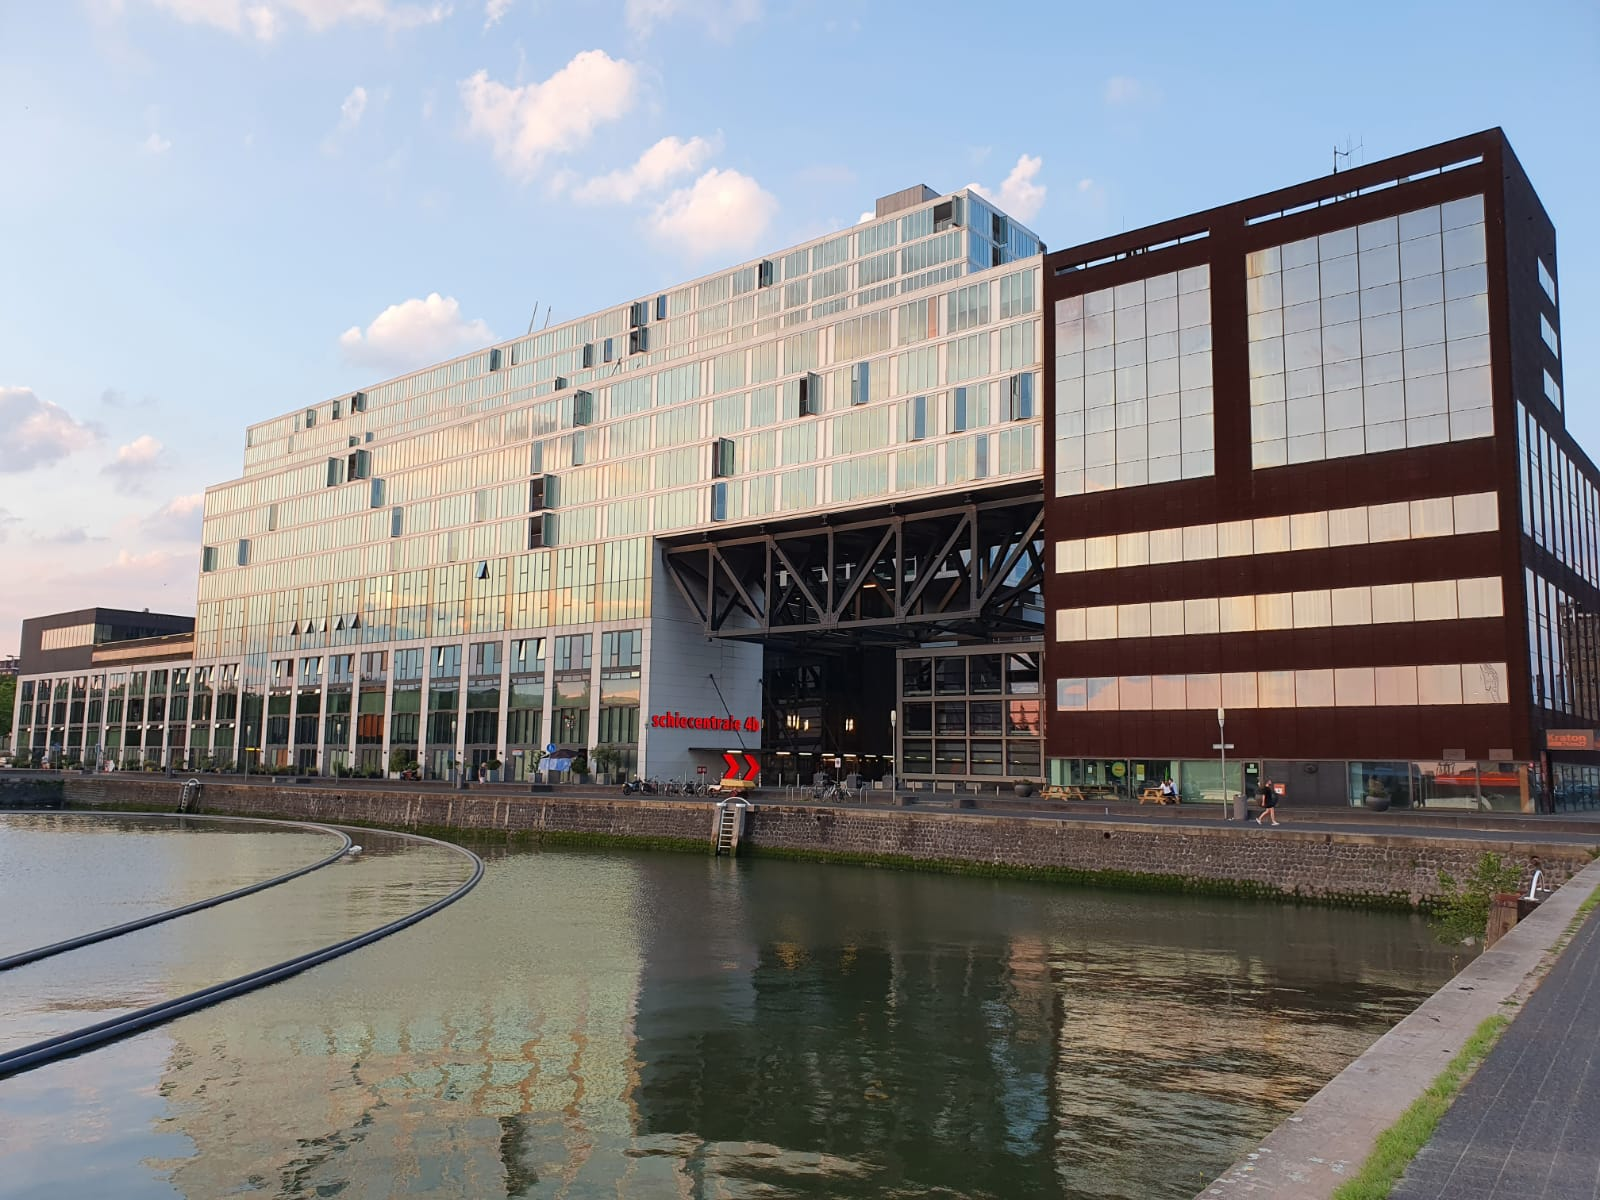 GoedOpOrde.nl Rotterdam